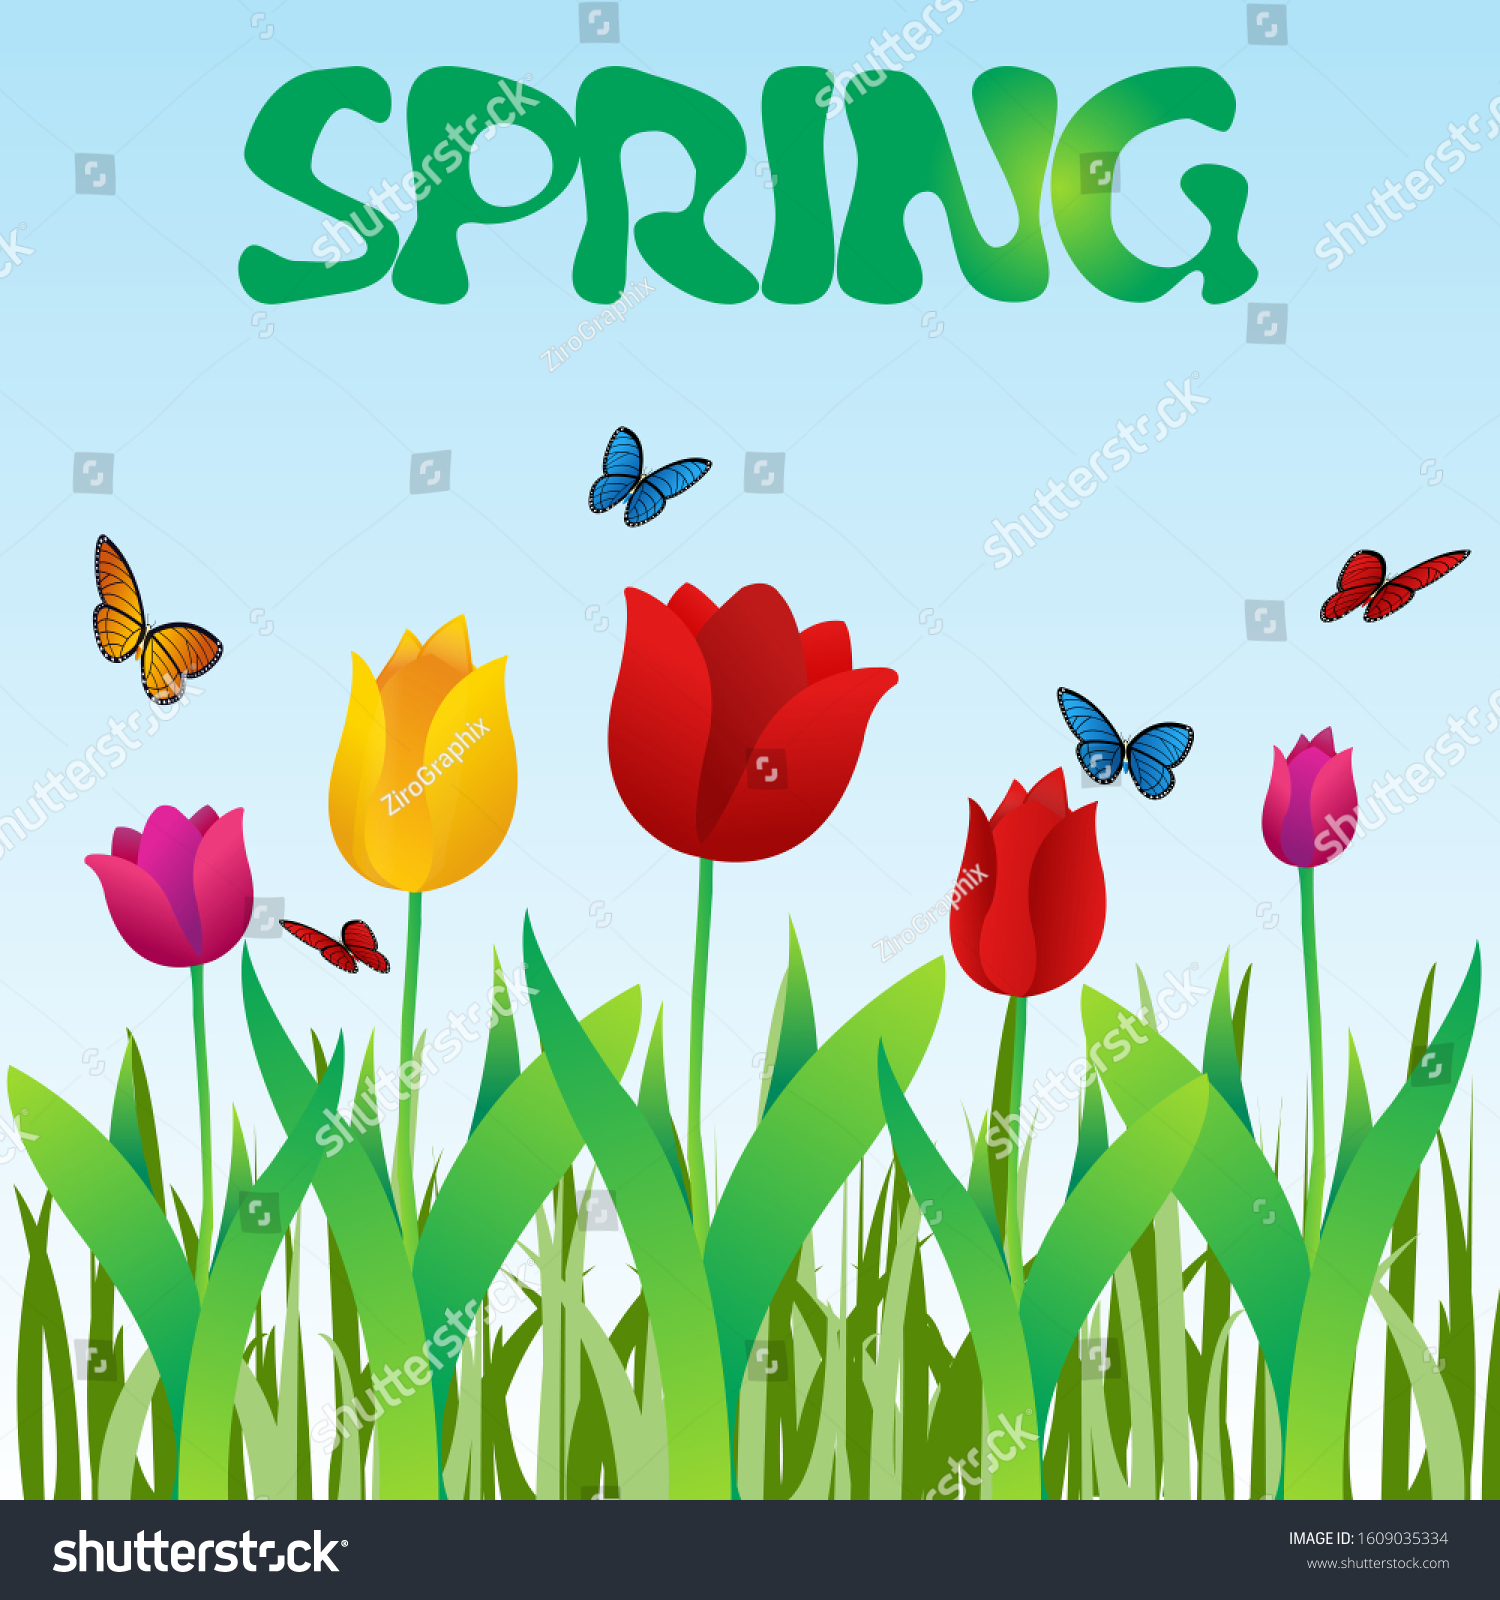 spring season vector illustration design stock vector (royalty free)  1609035334  shutterstock